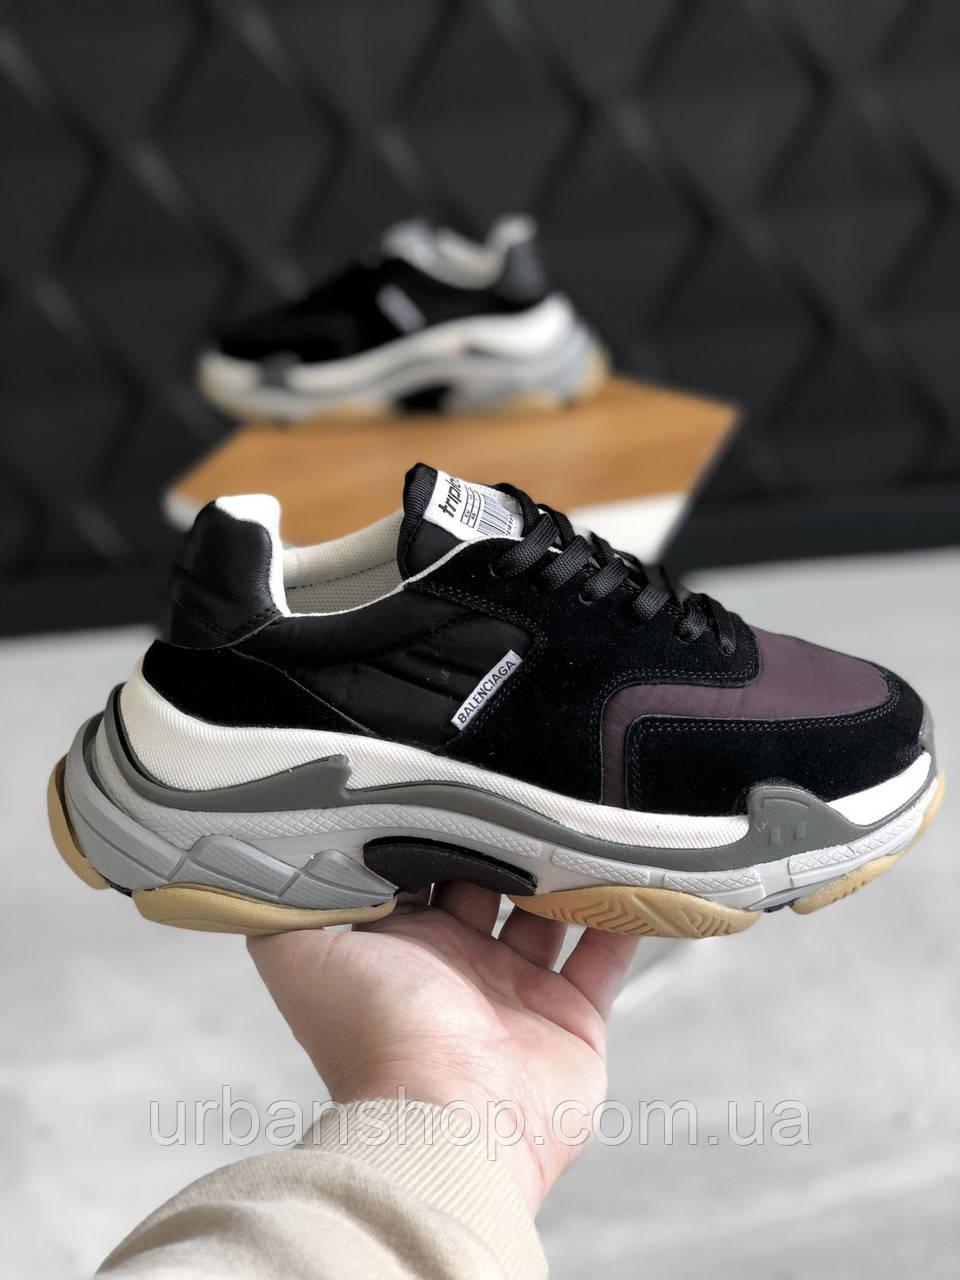 Взуття Balenciaga Tripl s V2 Black Burgundy 36